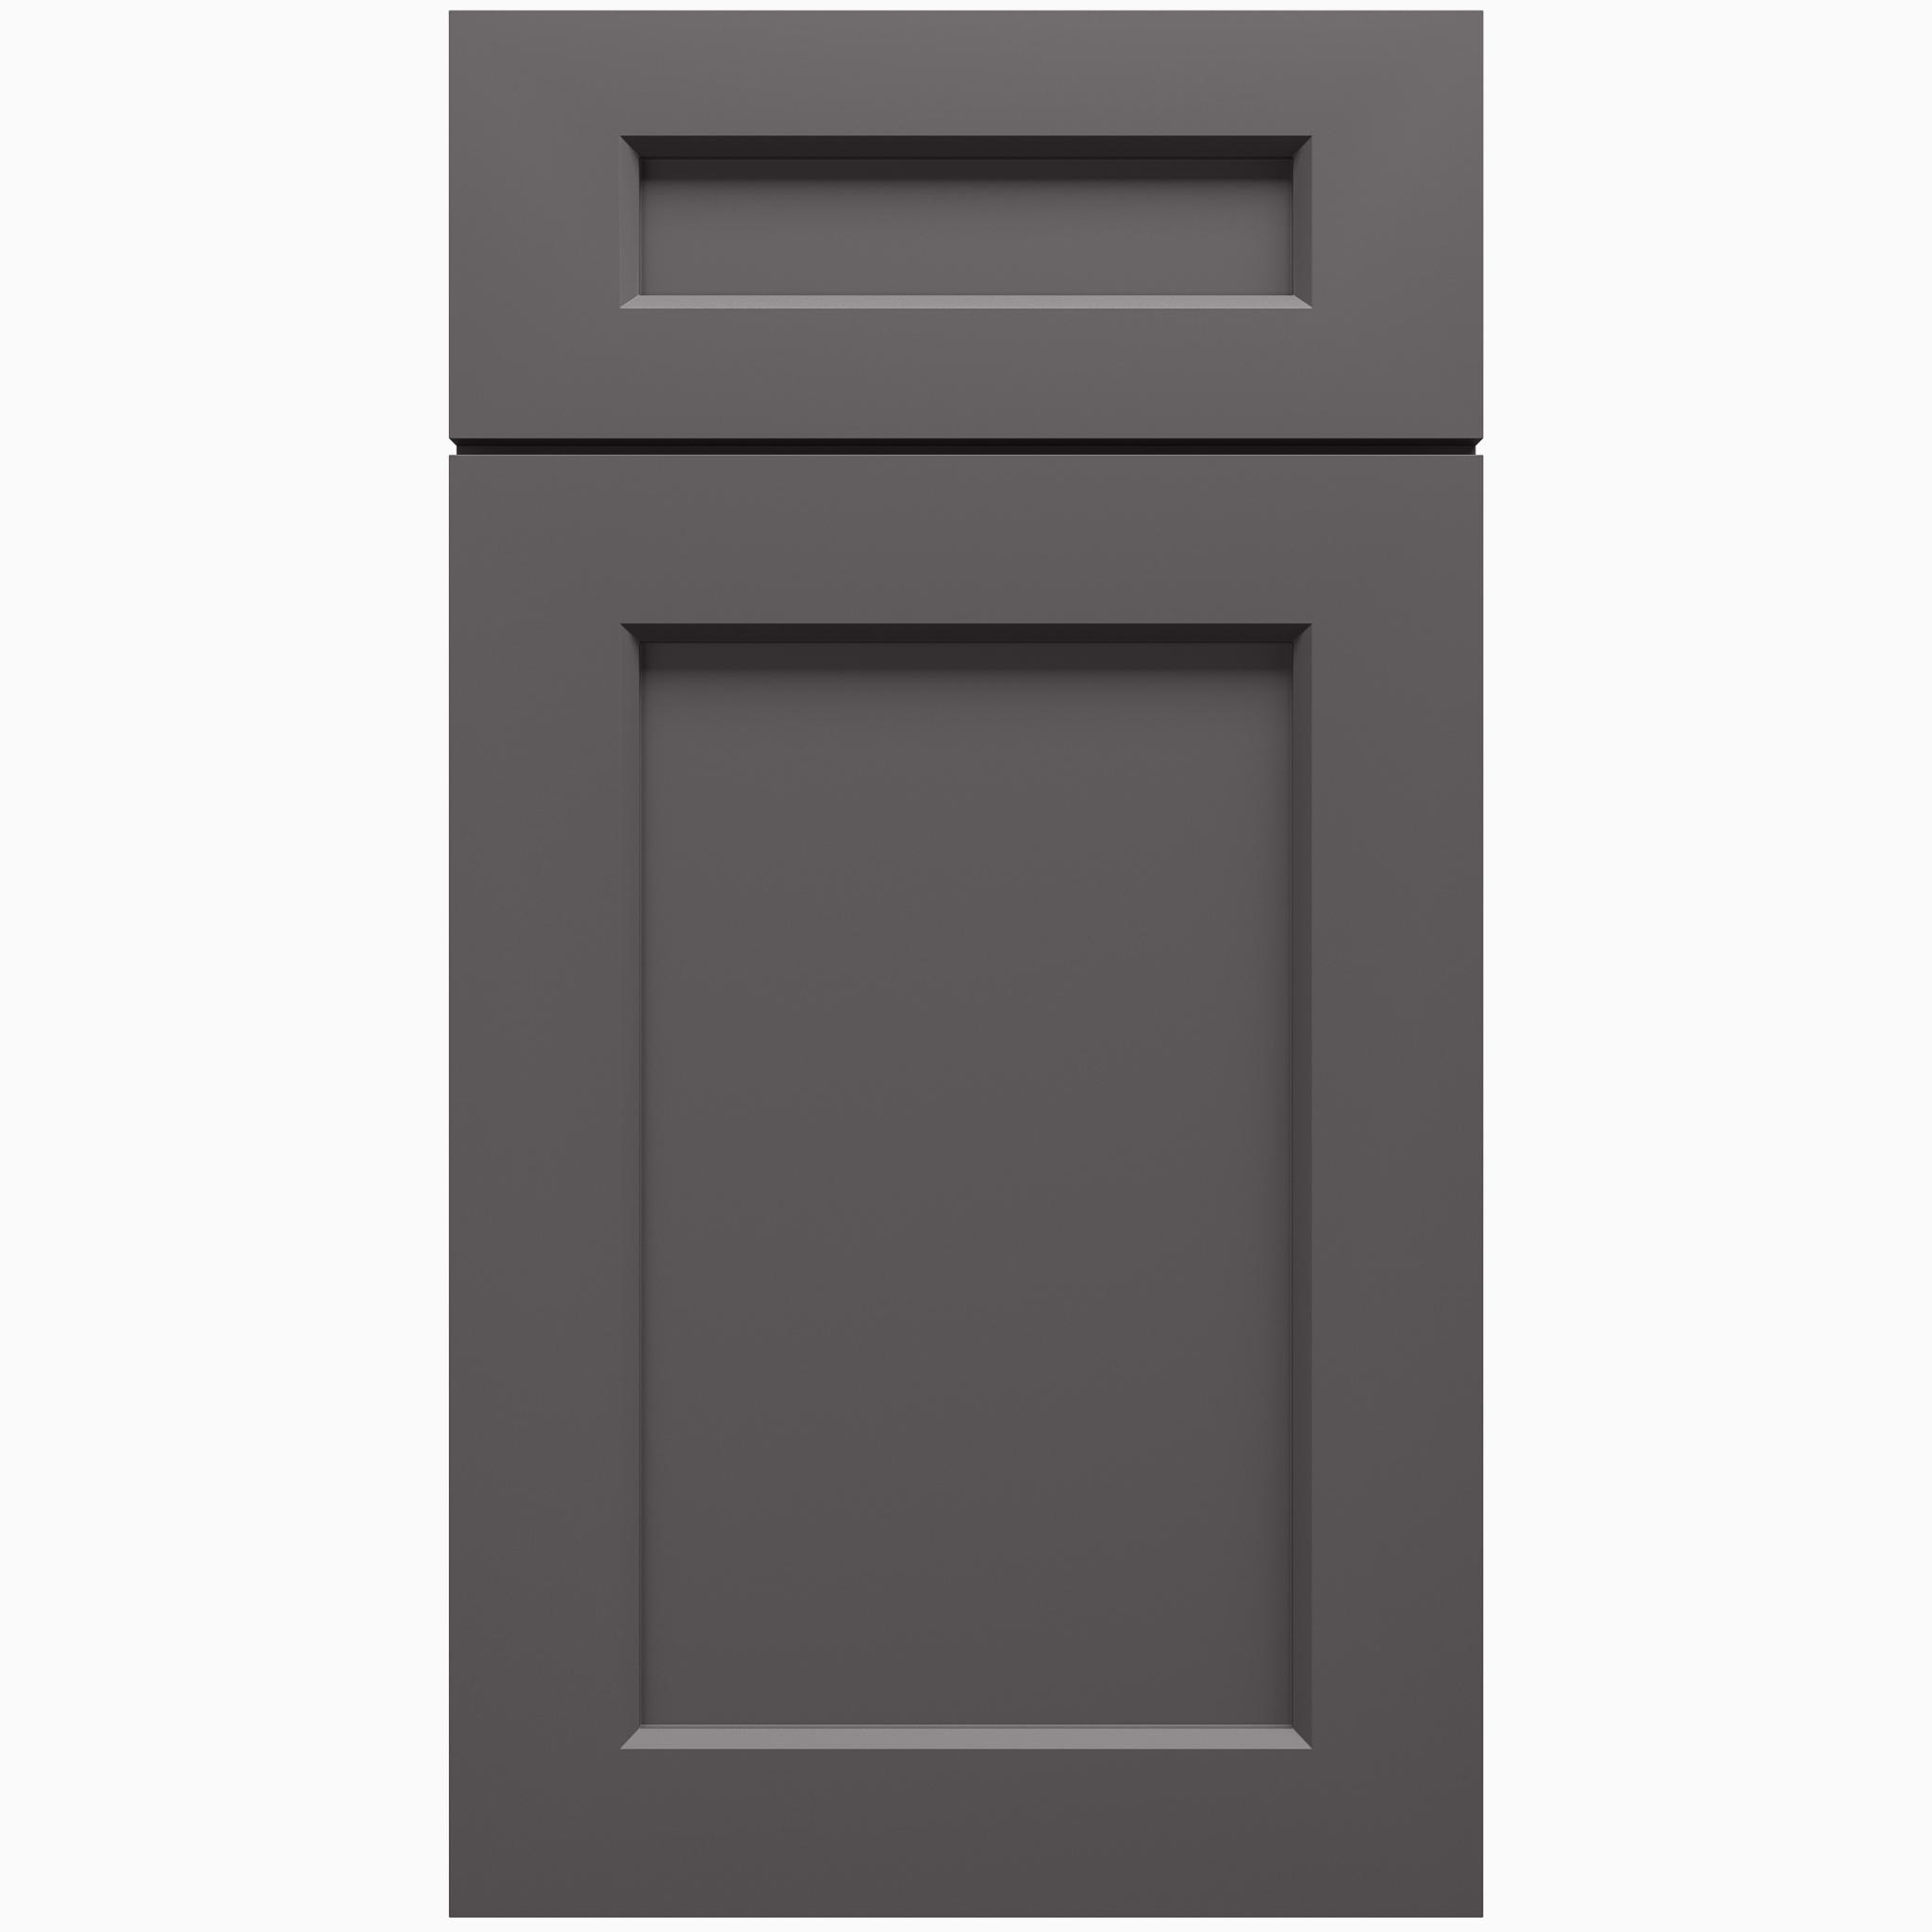 Liberty Shaker Grey Cabinets